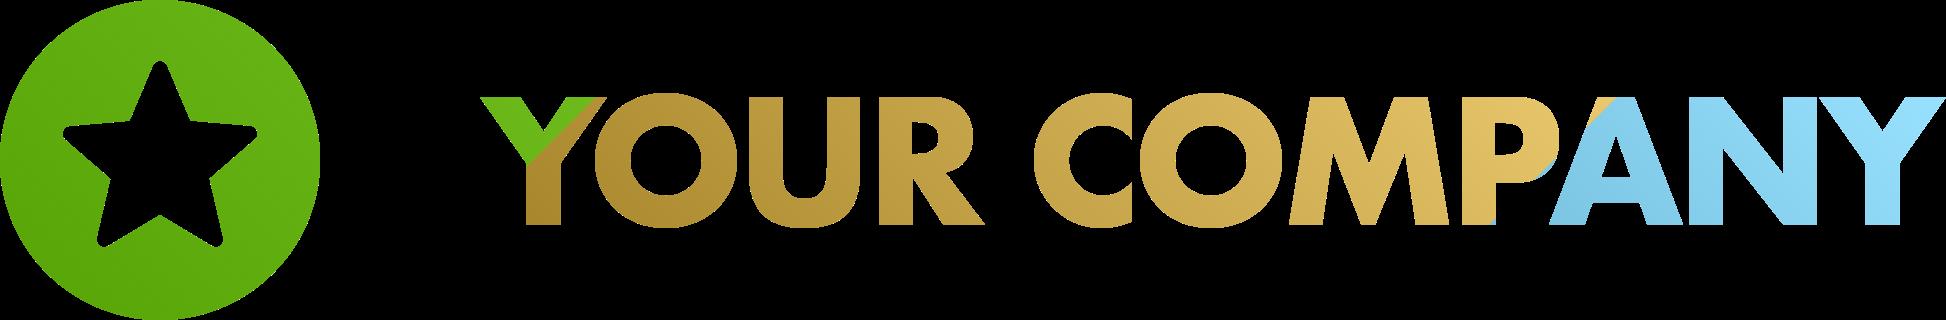 Your Company logotype